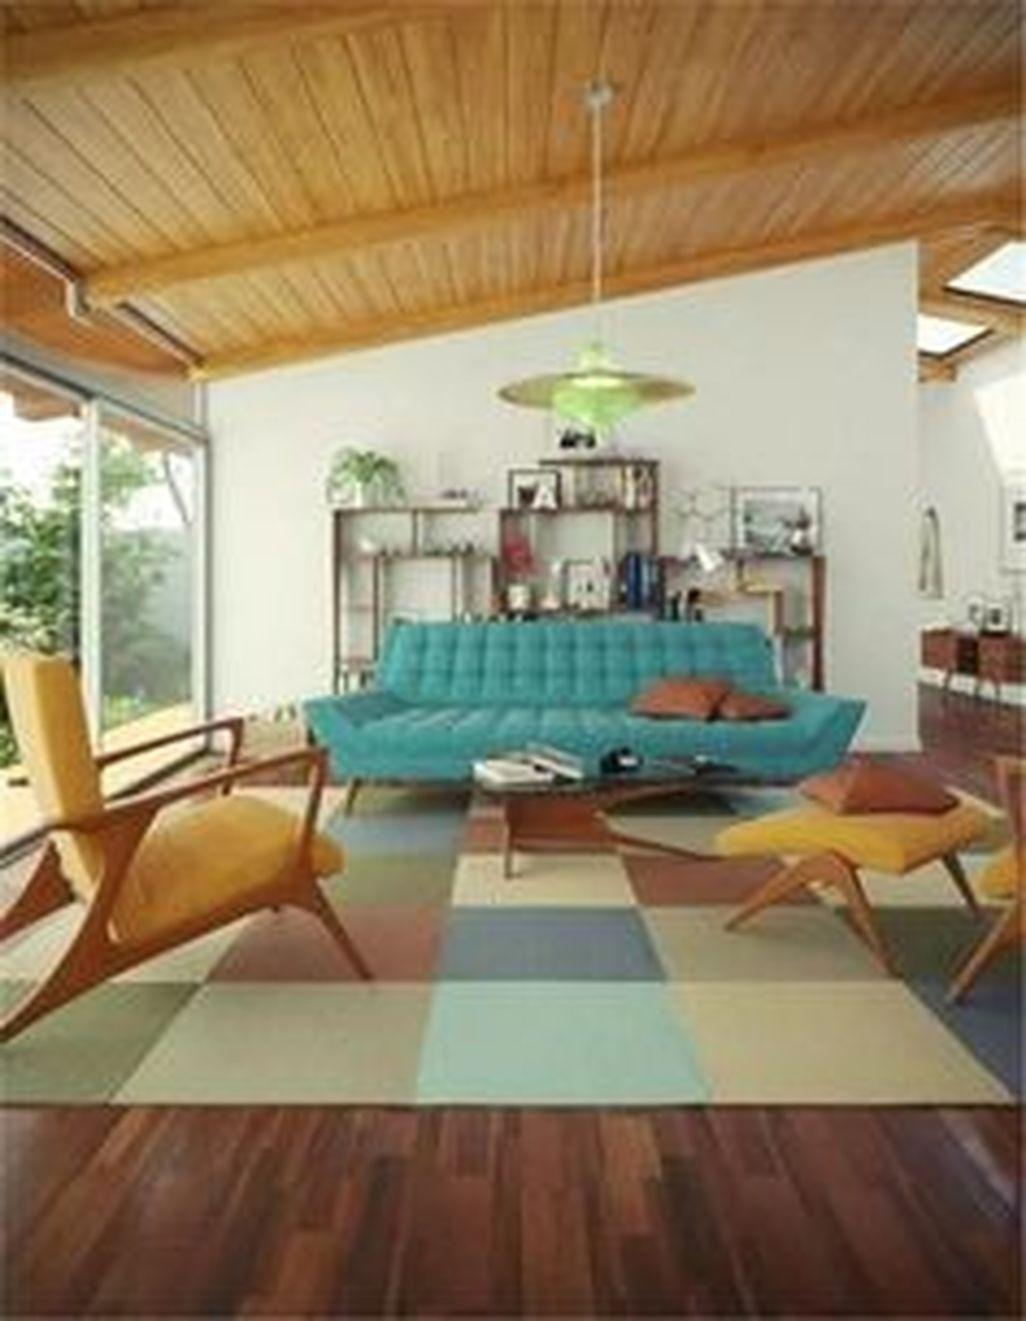 40 Cozy Living Room Decorating Ideas: 40 Cozy Modern Midcentury Living Room Decorating Ideas